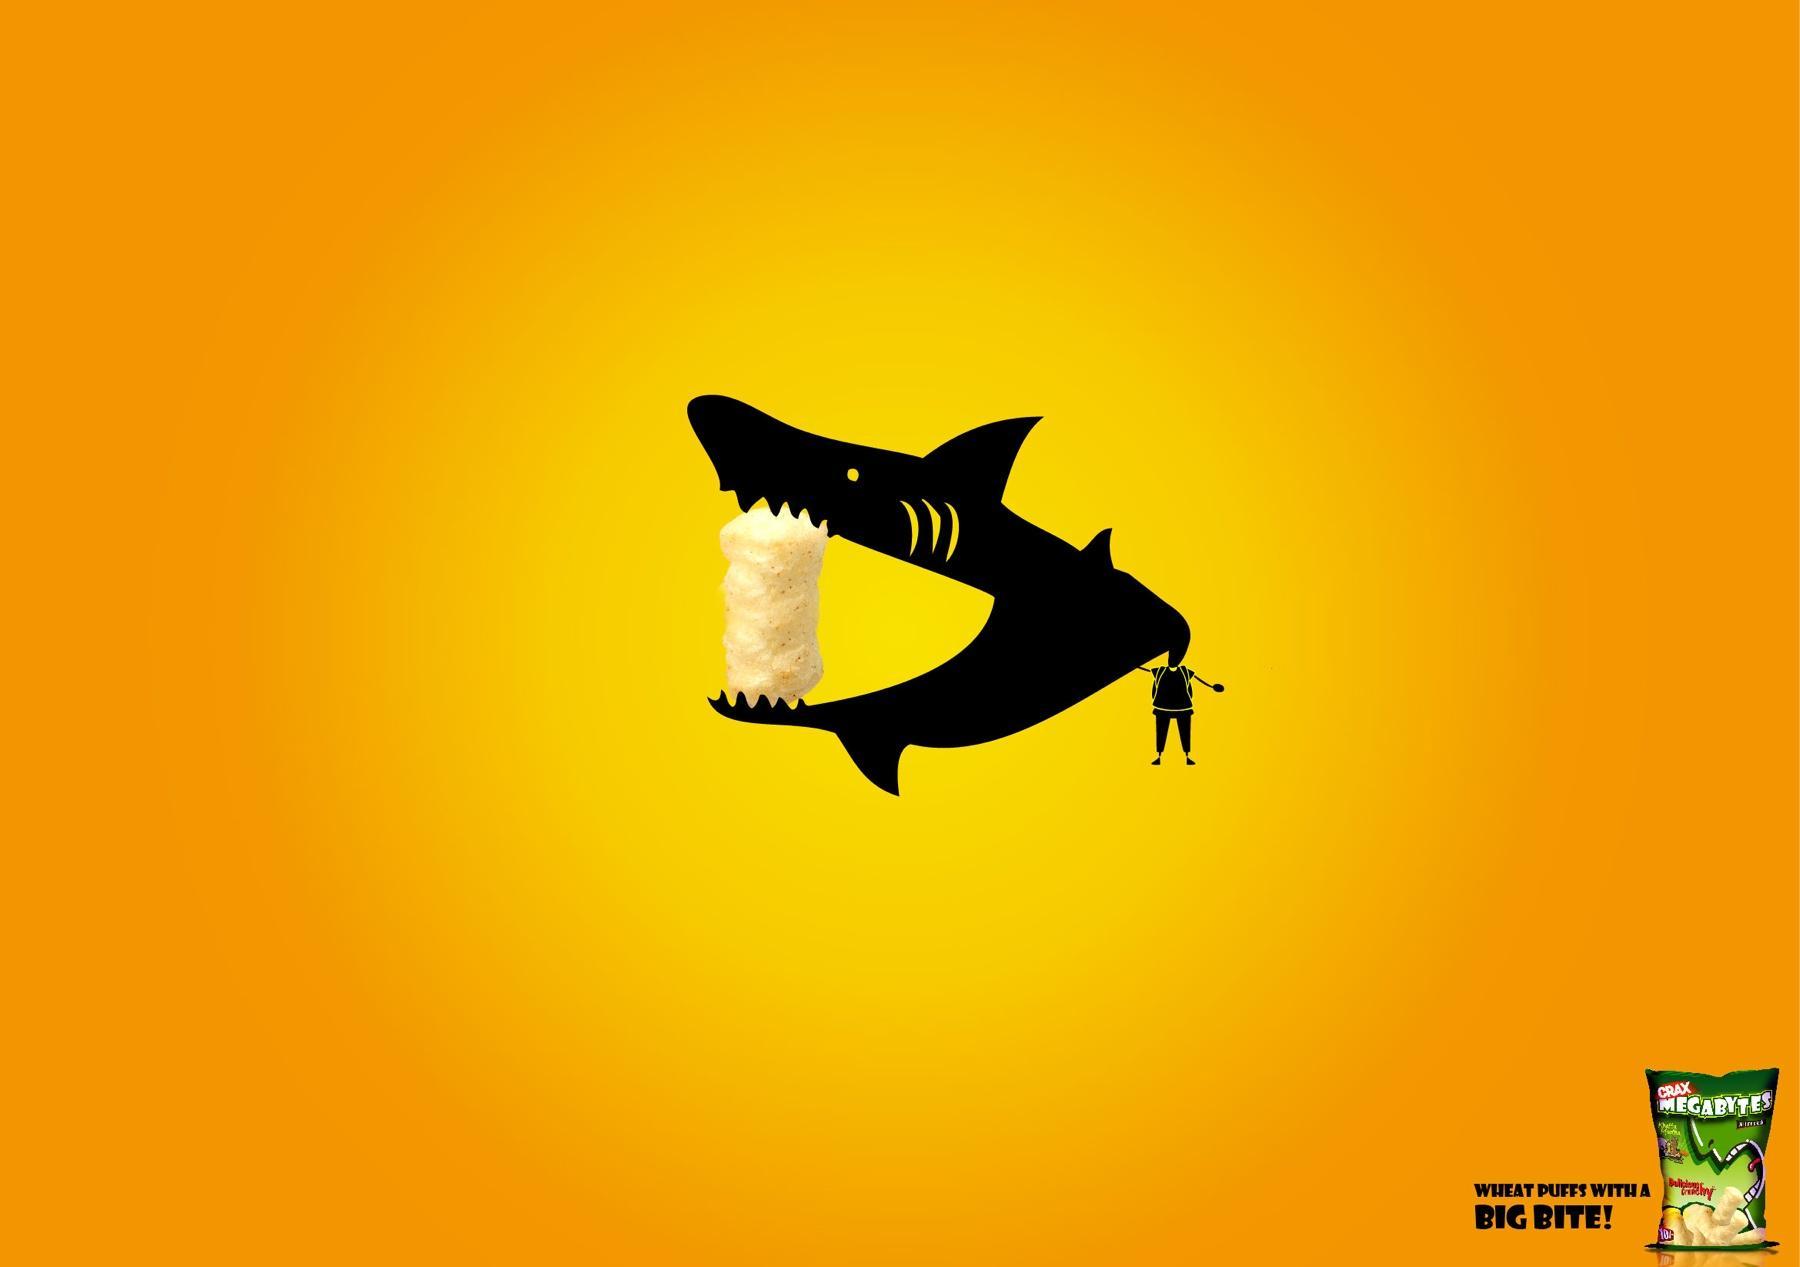 Crax puffs Print Ad -  Mouth Wide Open, Shark